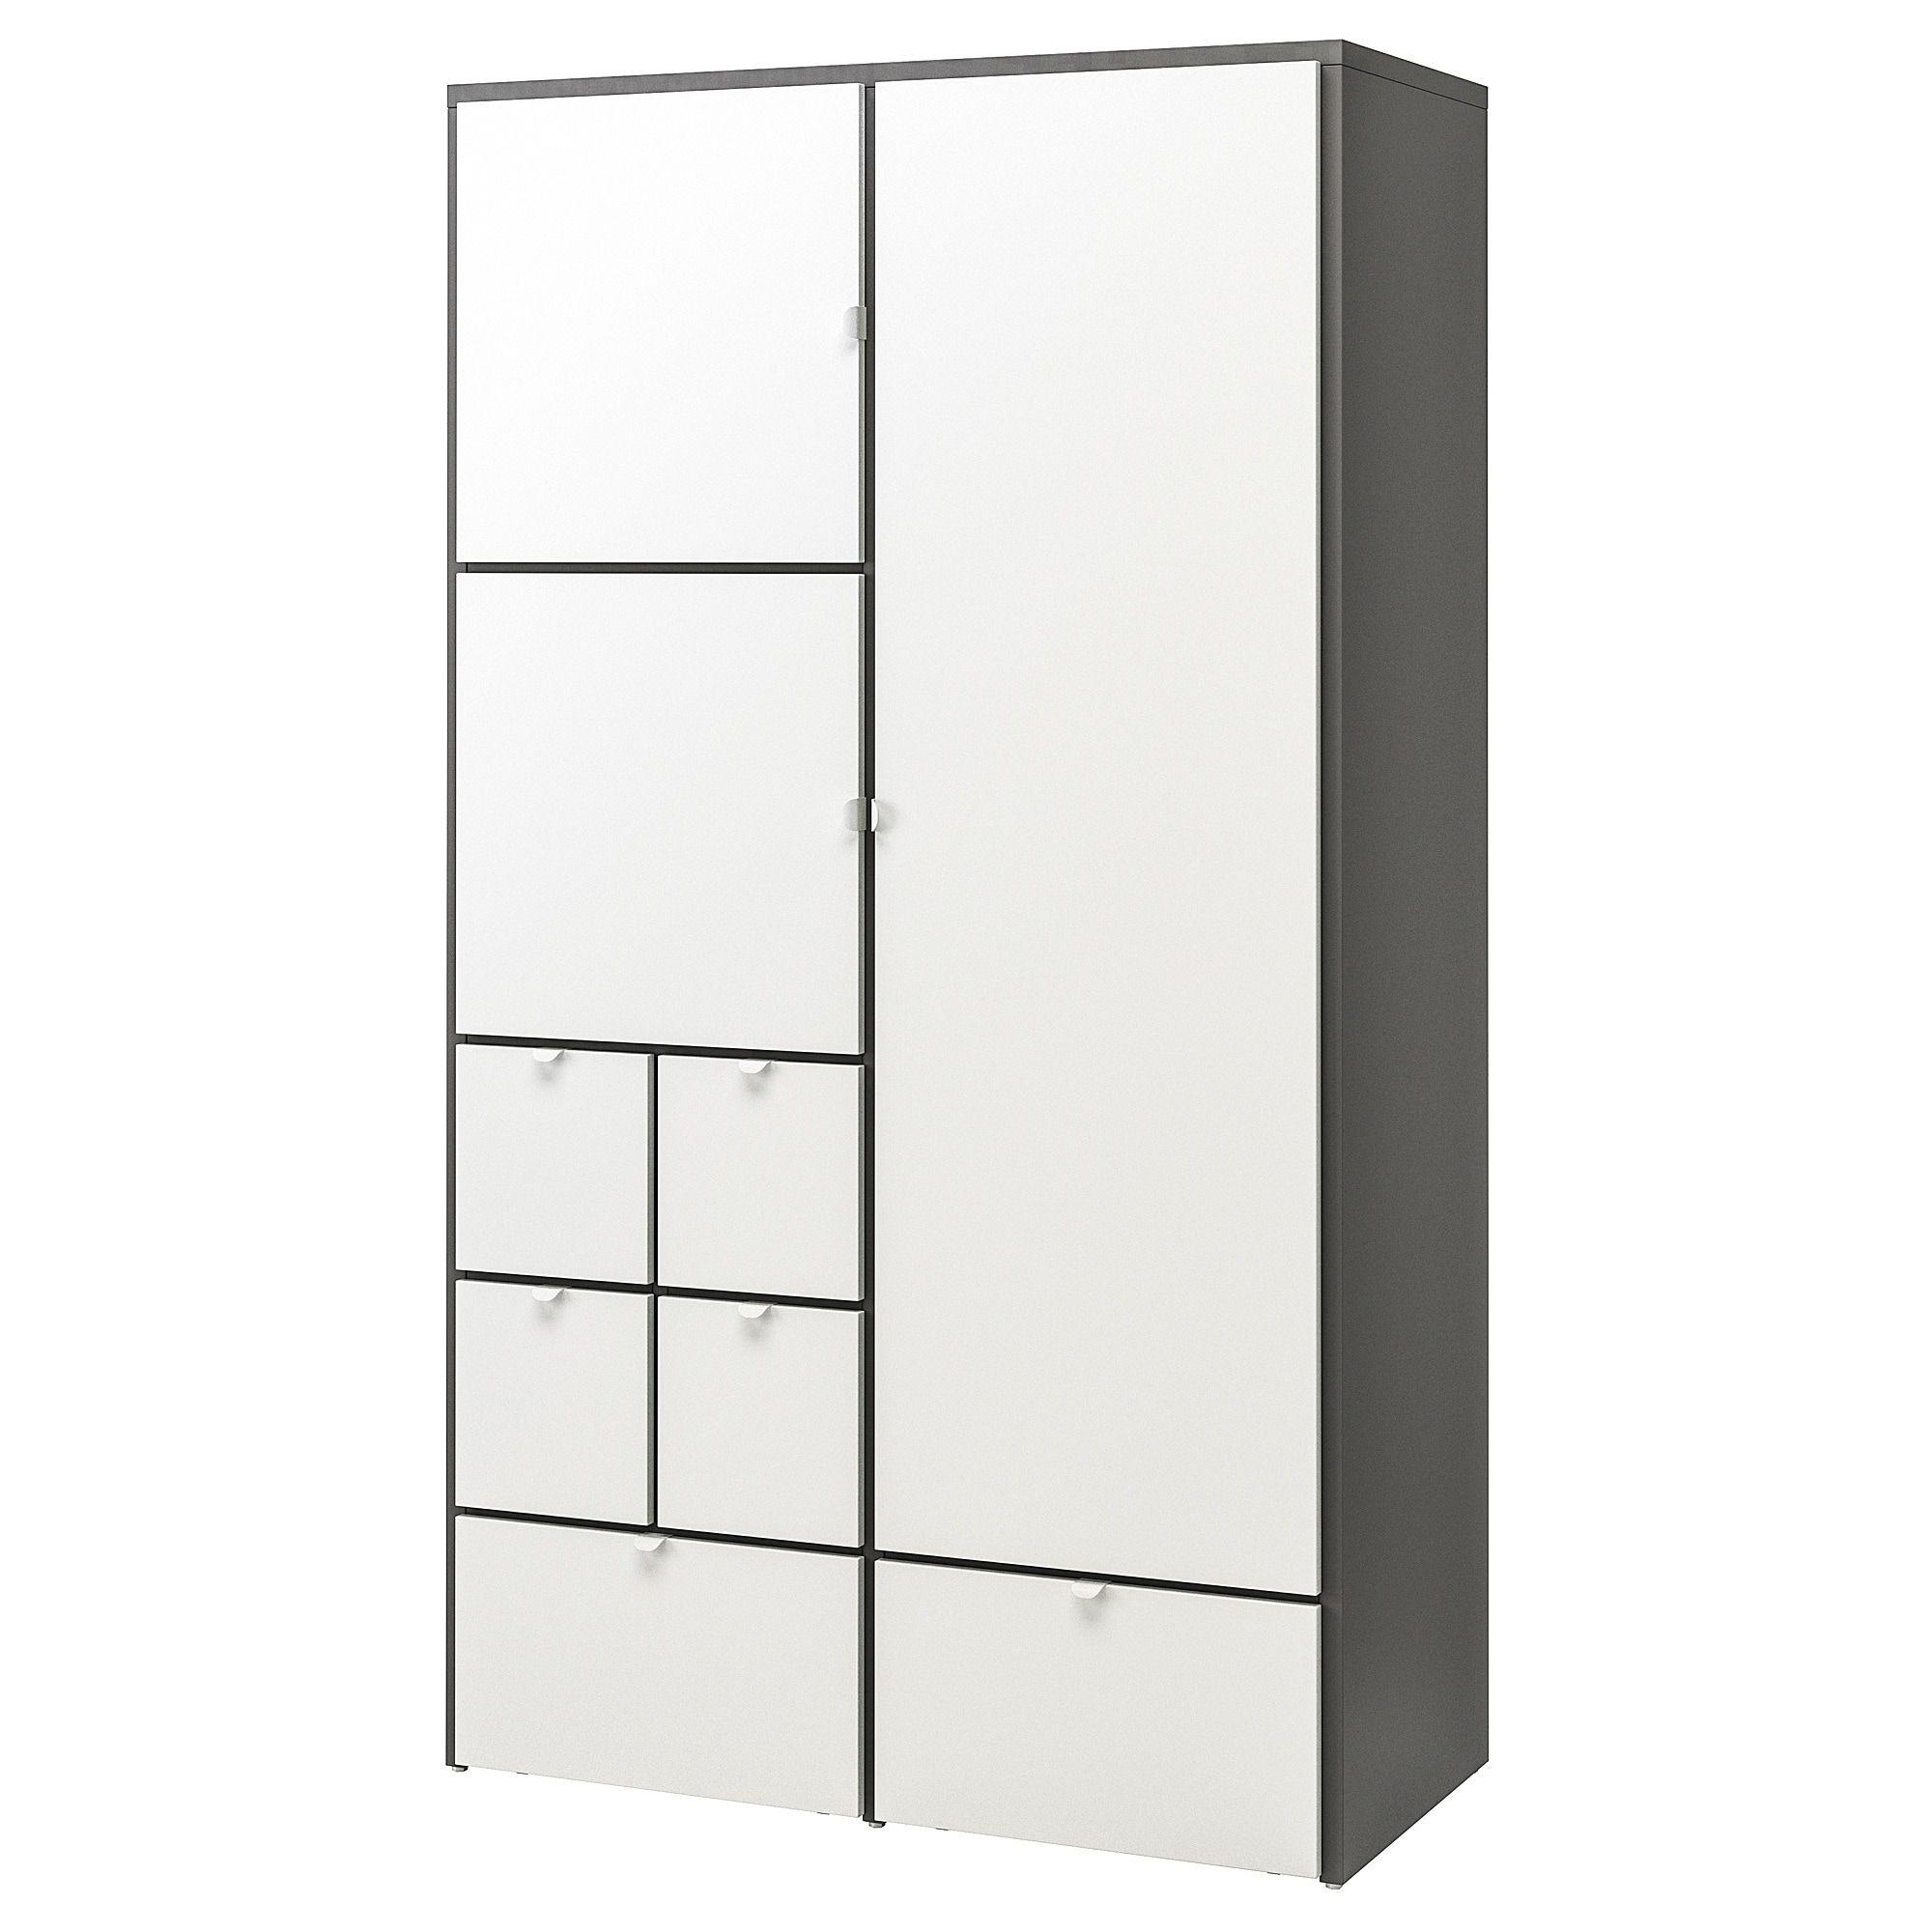 Grey Wardrobe Ikea - Vascular